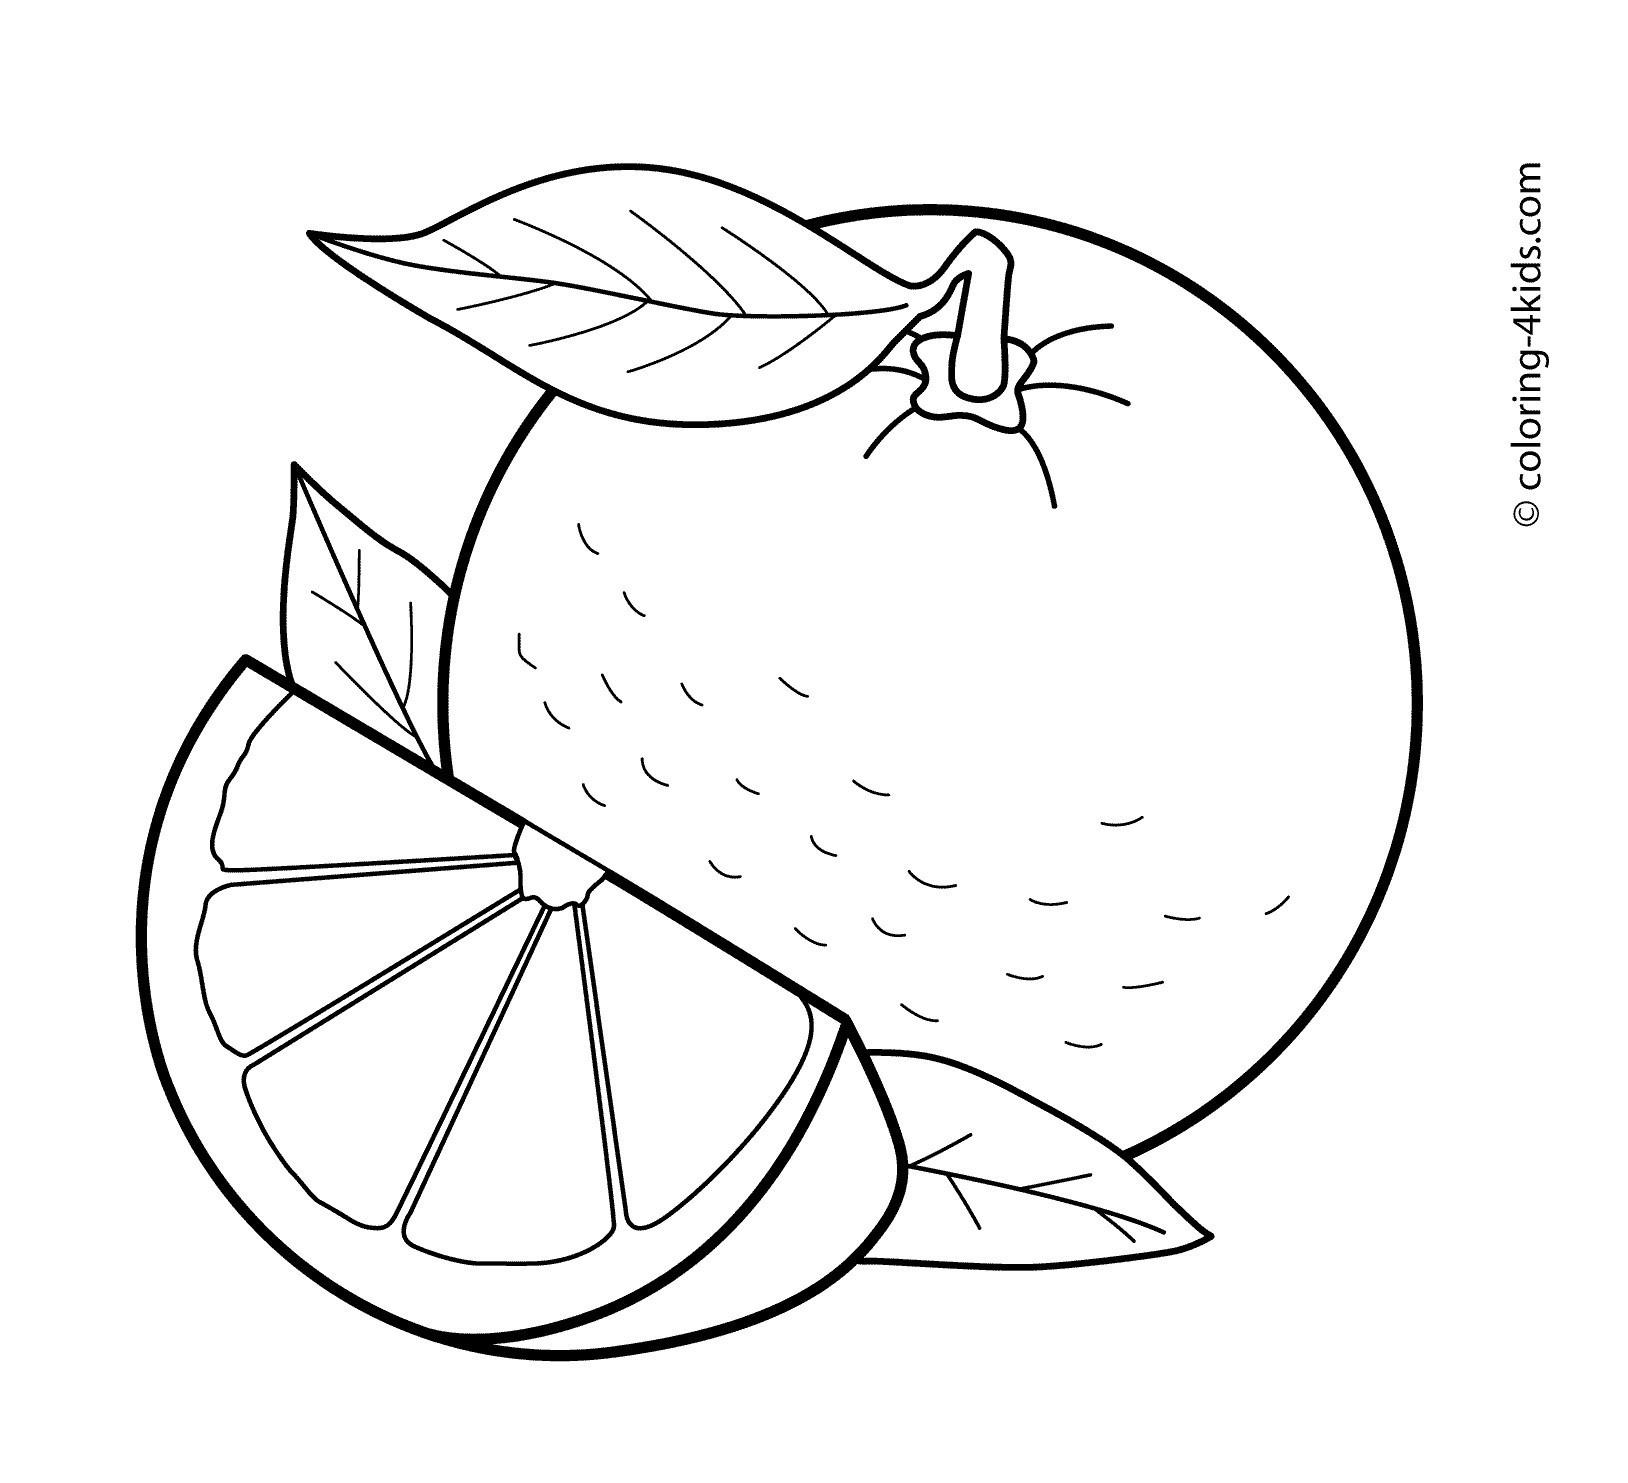 Black and white clipart orange graphic transparent Orange fruit clipart black and white 1 » Clipart Station graphic transparent